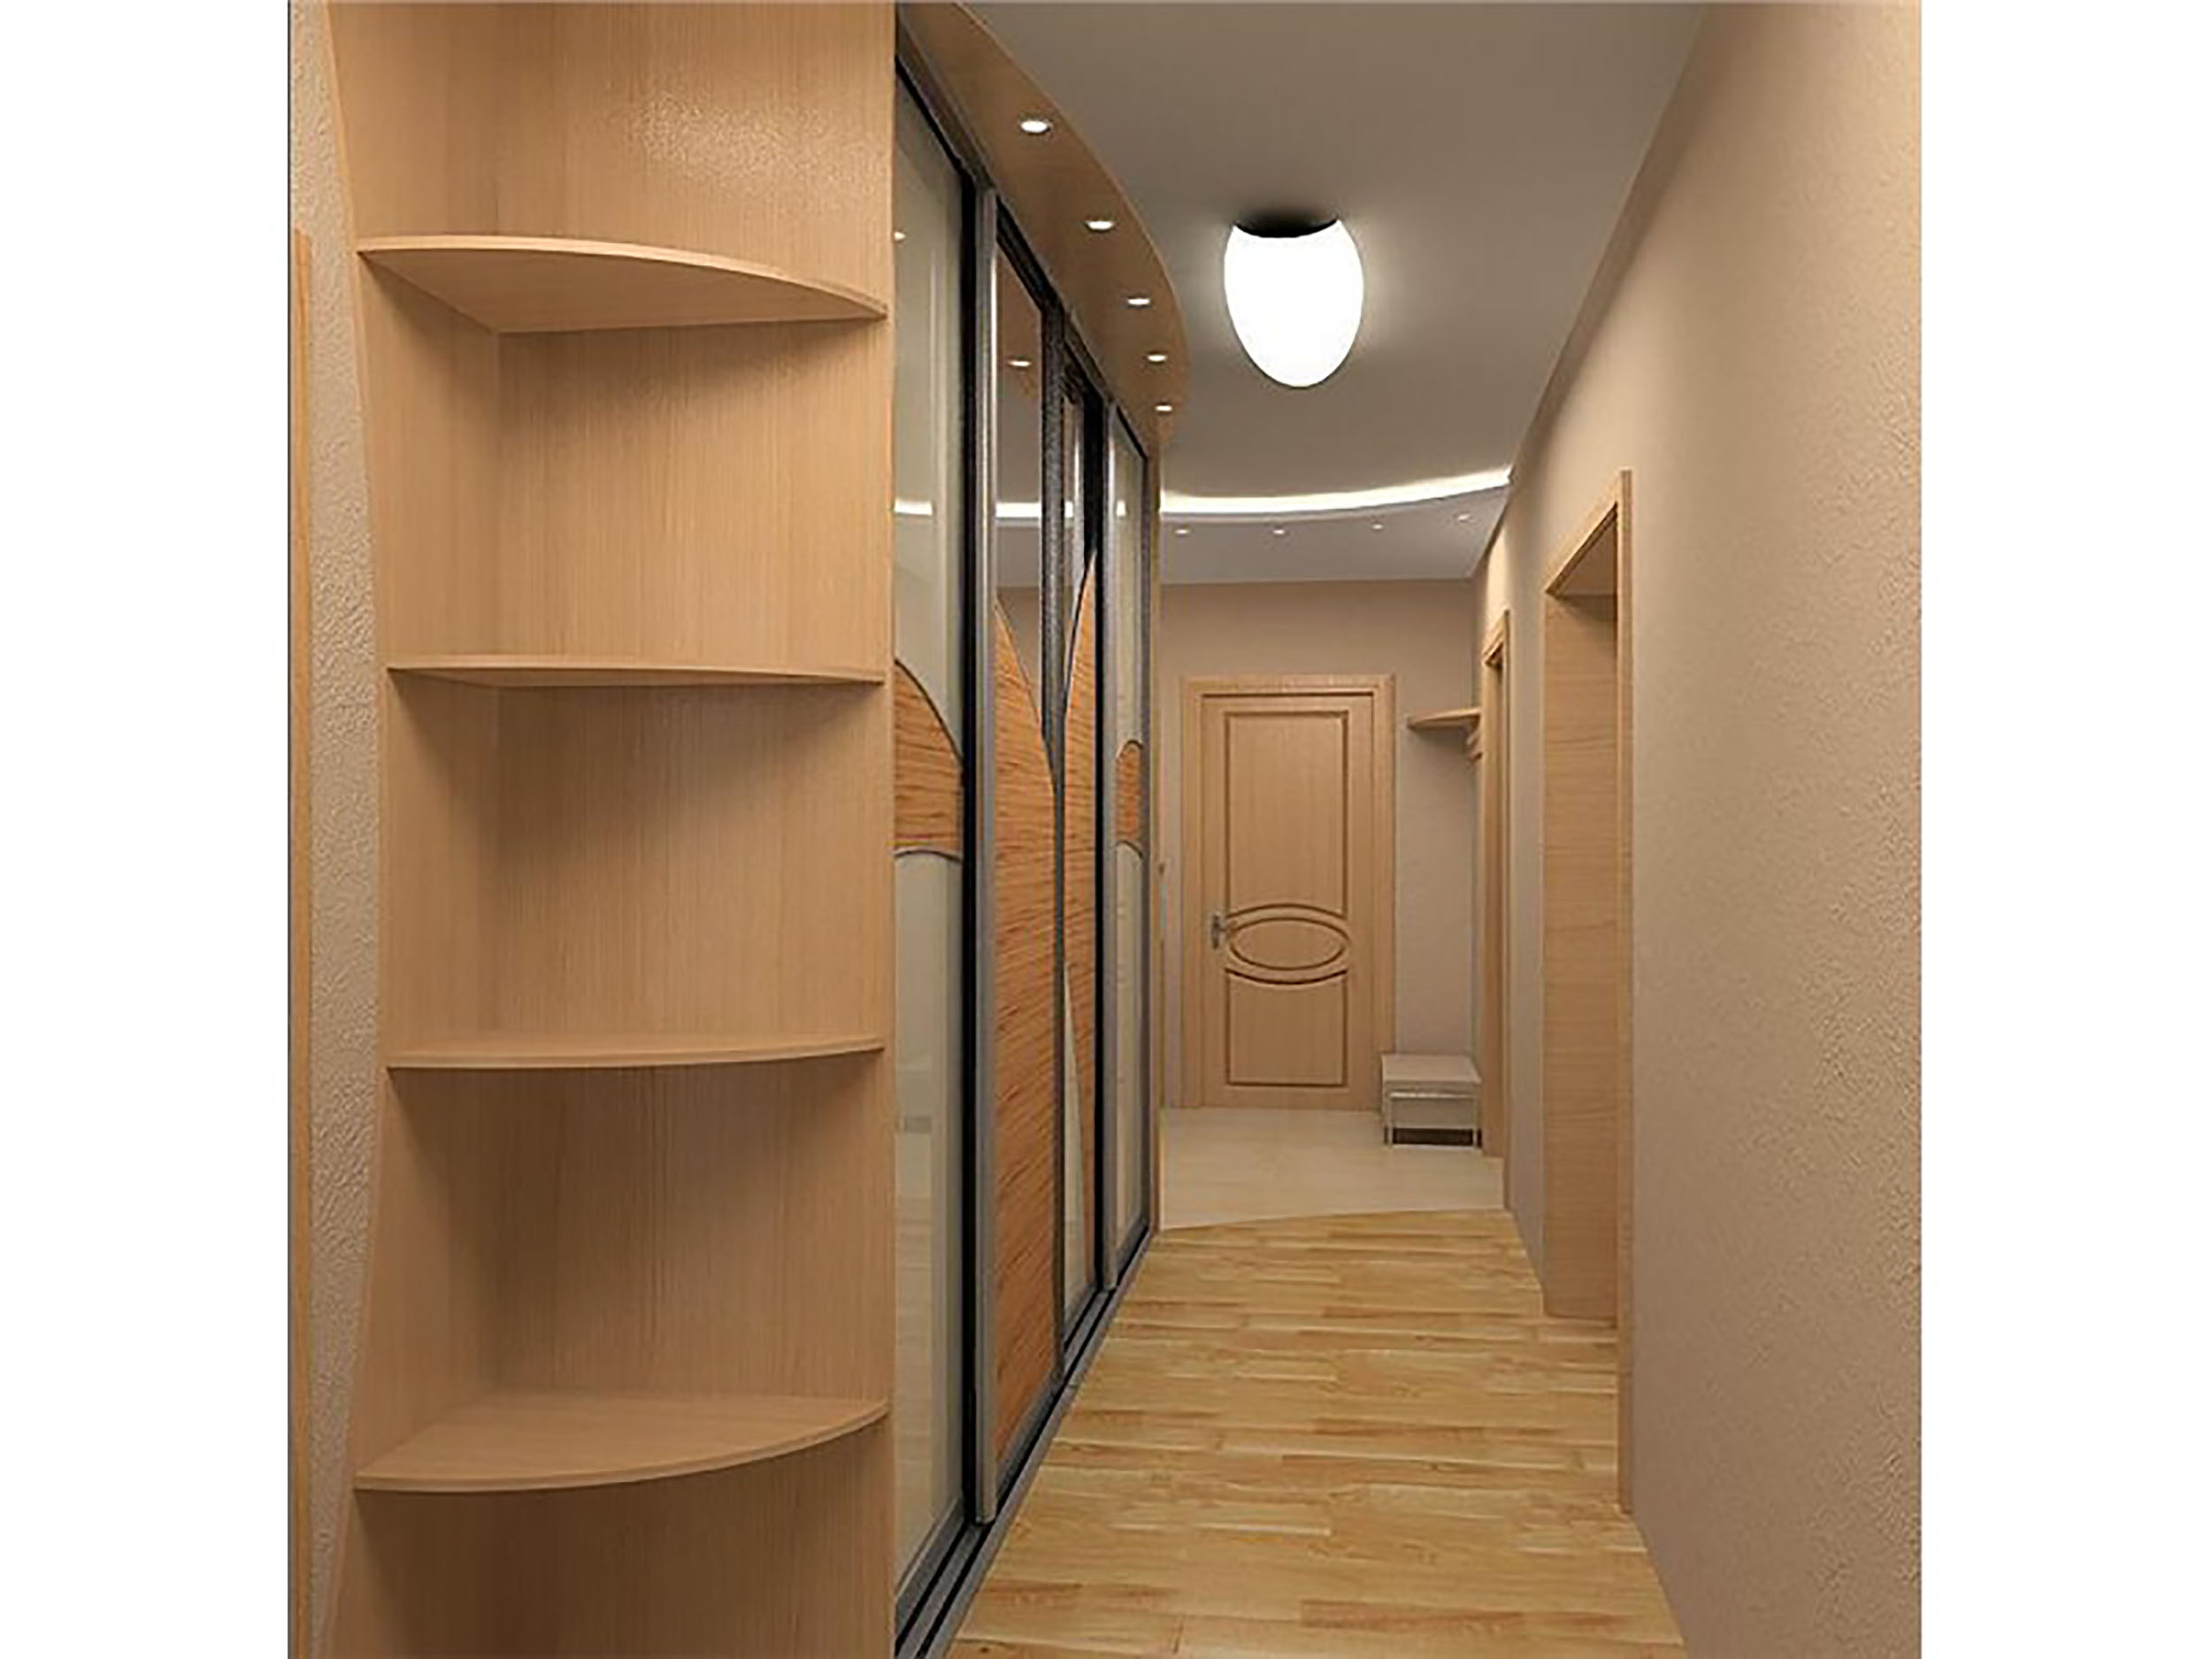 "Дизайн узкого коридора."" - карточка пользователя dolzhenkova."